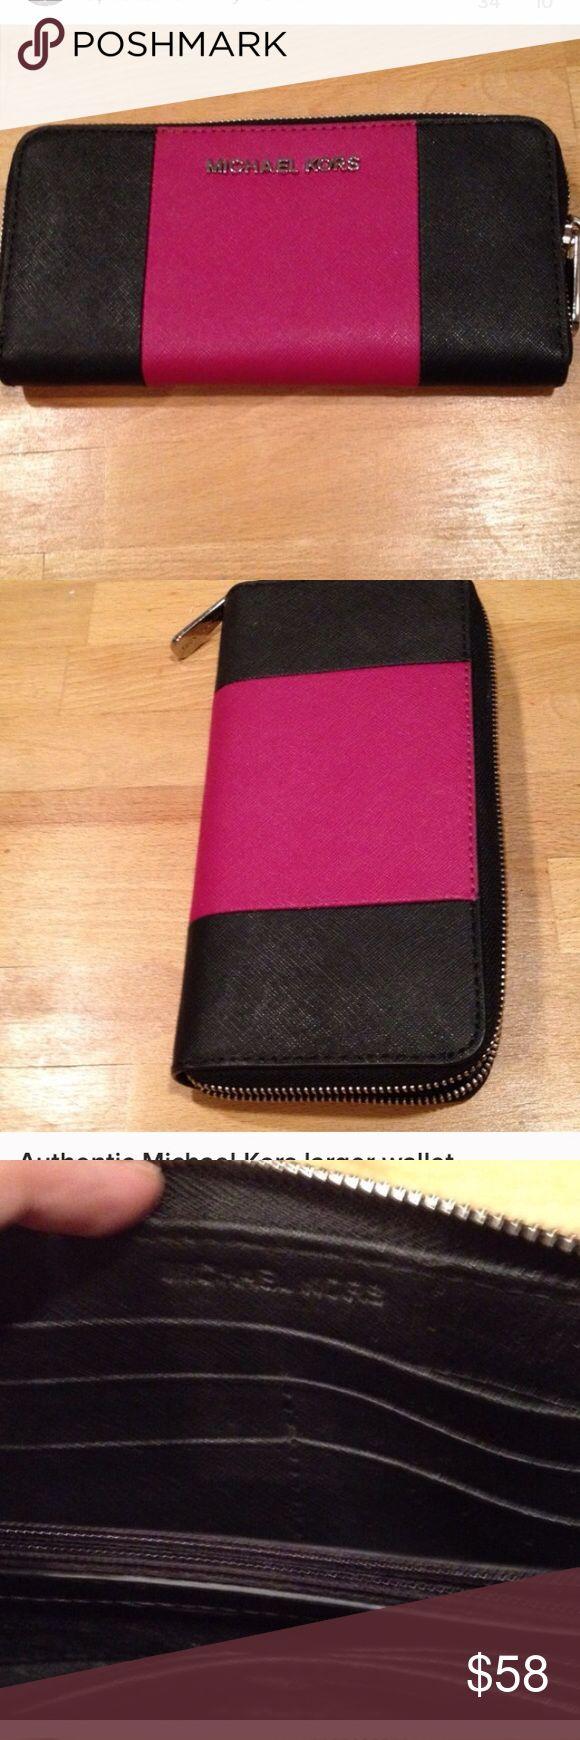 Atlantic Michael Kross new wallet Lots pocket , zipper coin . New 8 plus more slots , 2 spots to hold cash Michael Kors Accessories